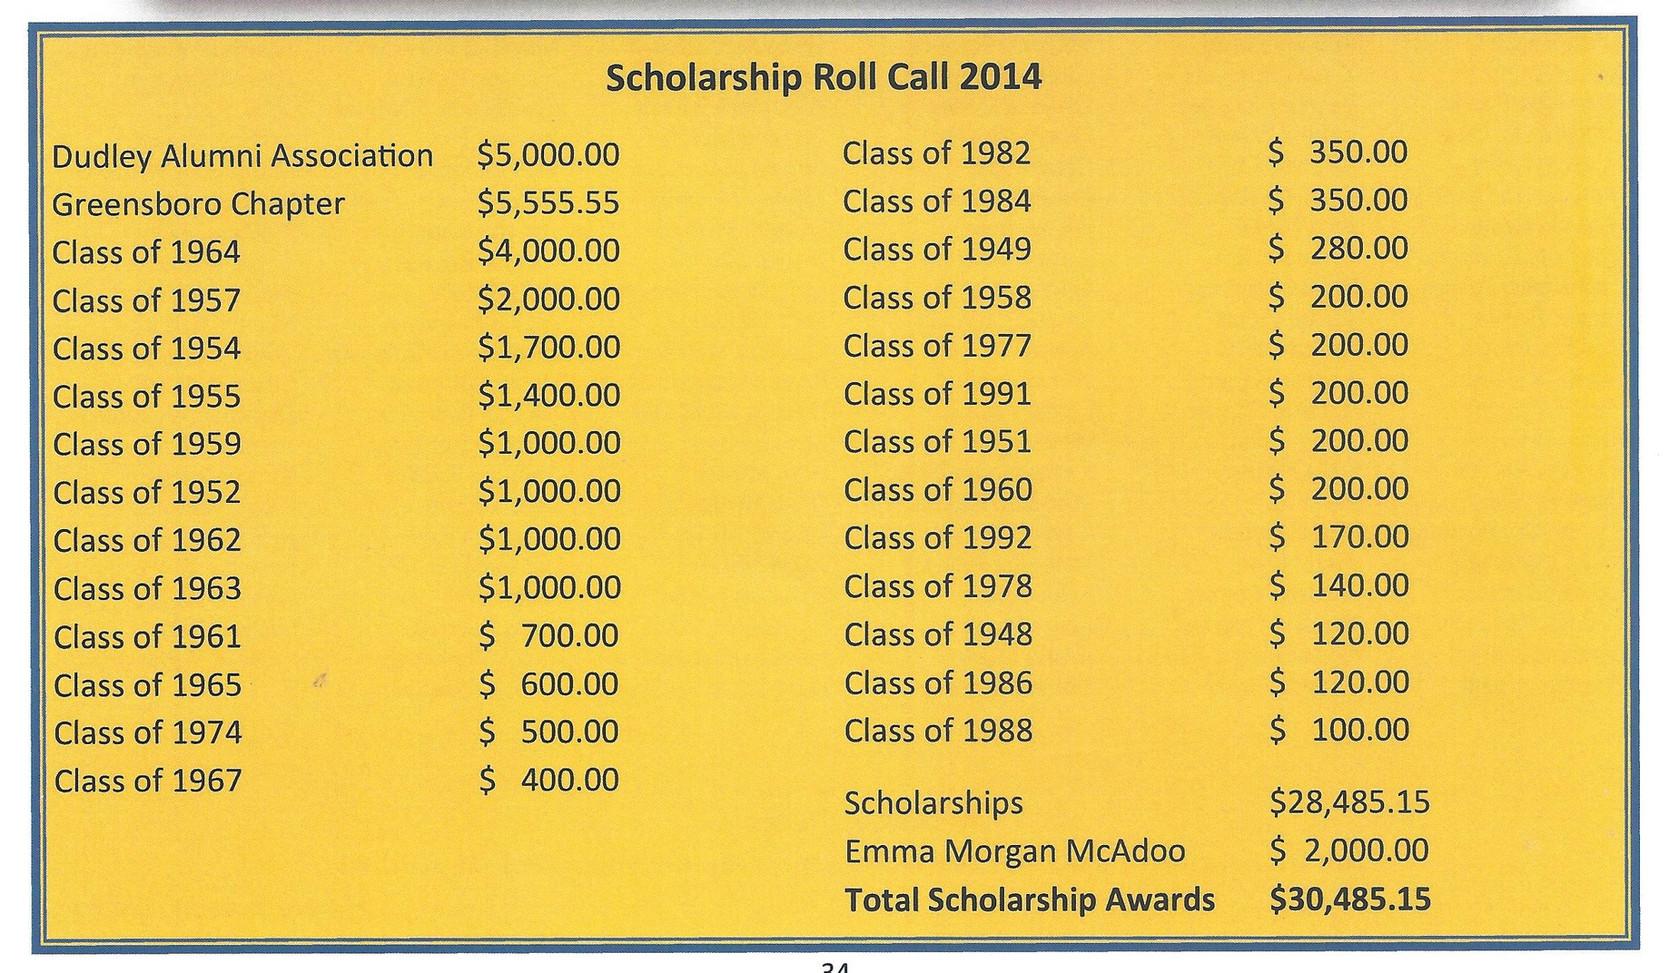 Roll Call 2014